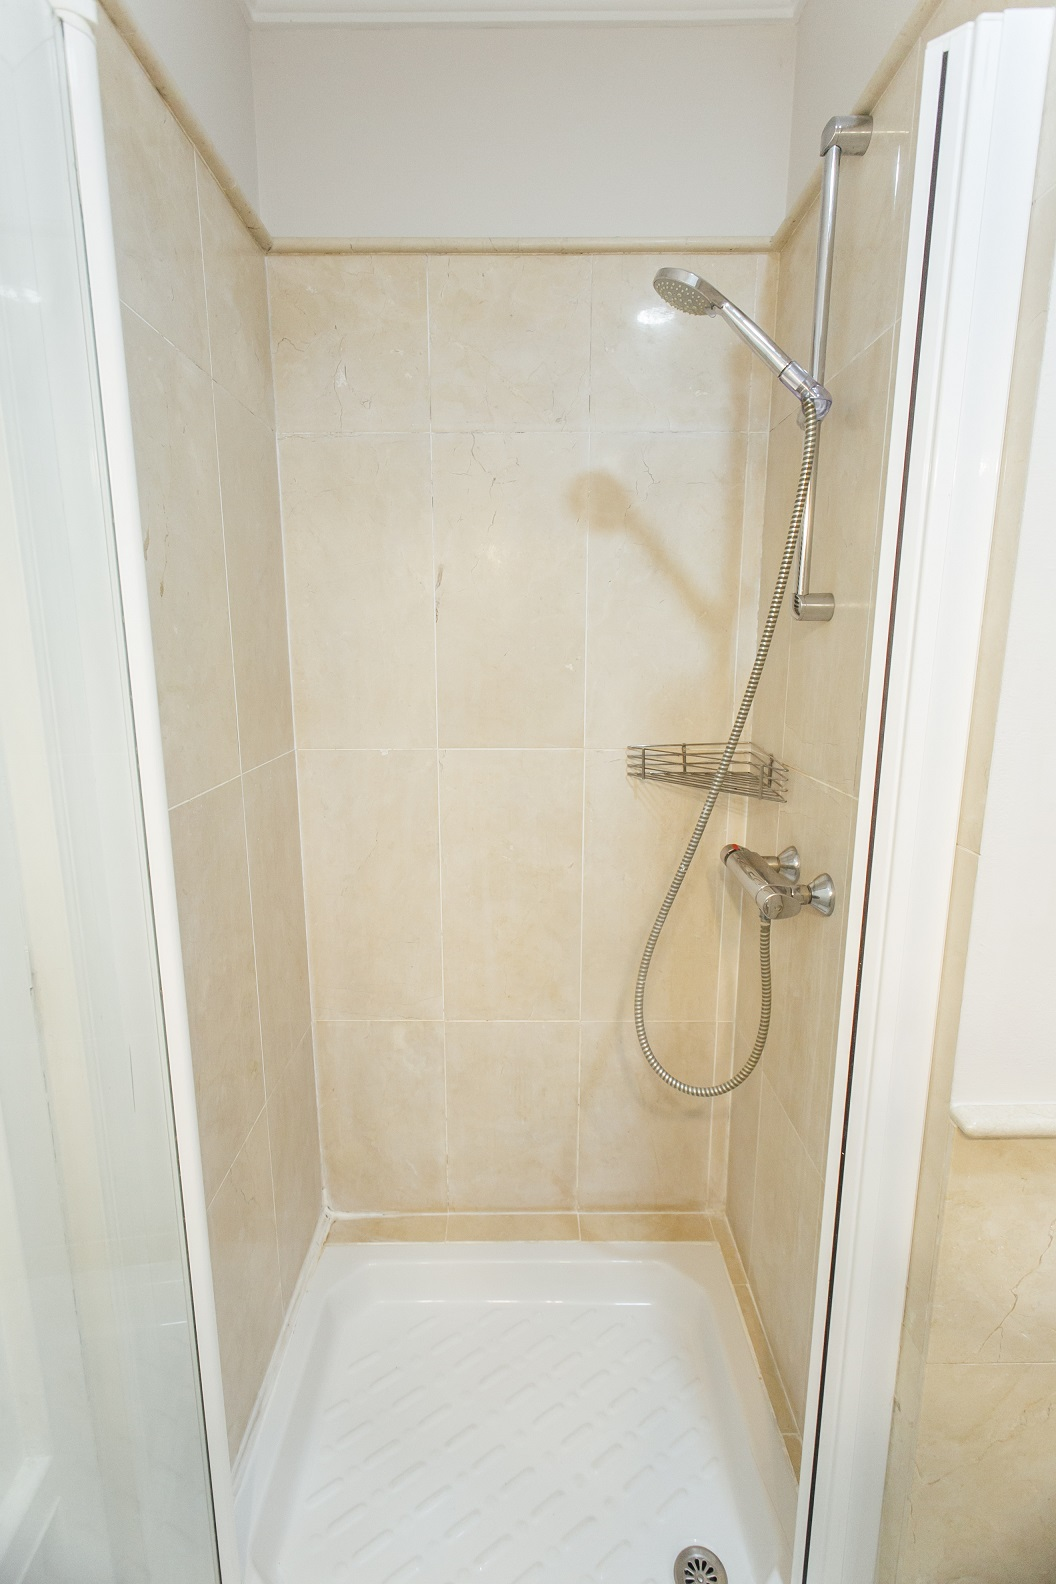 Shower head at Diego De Riano Apartment